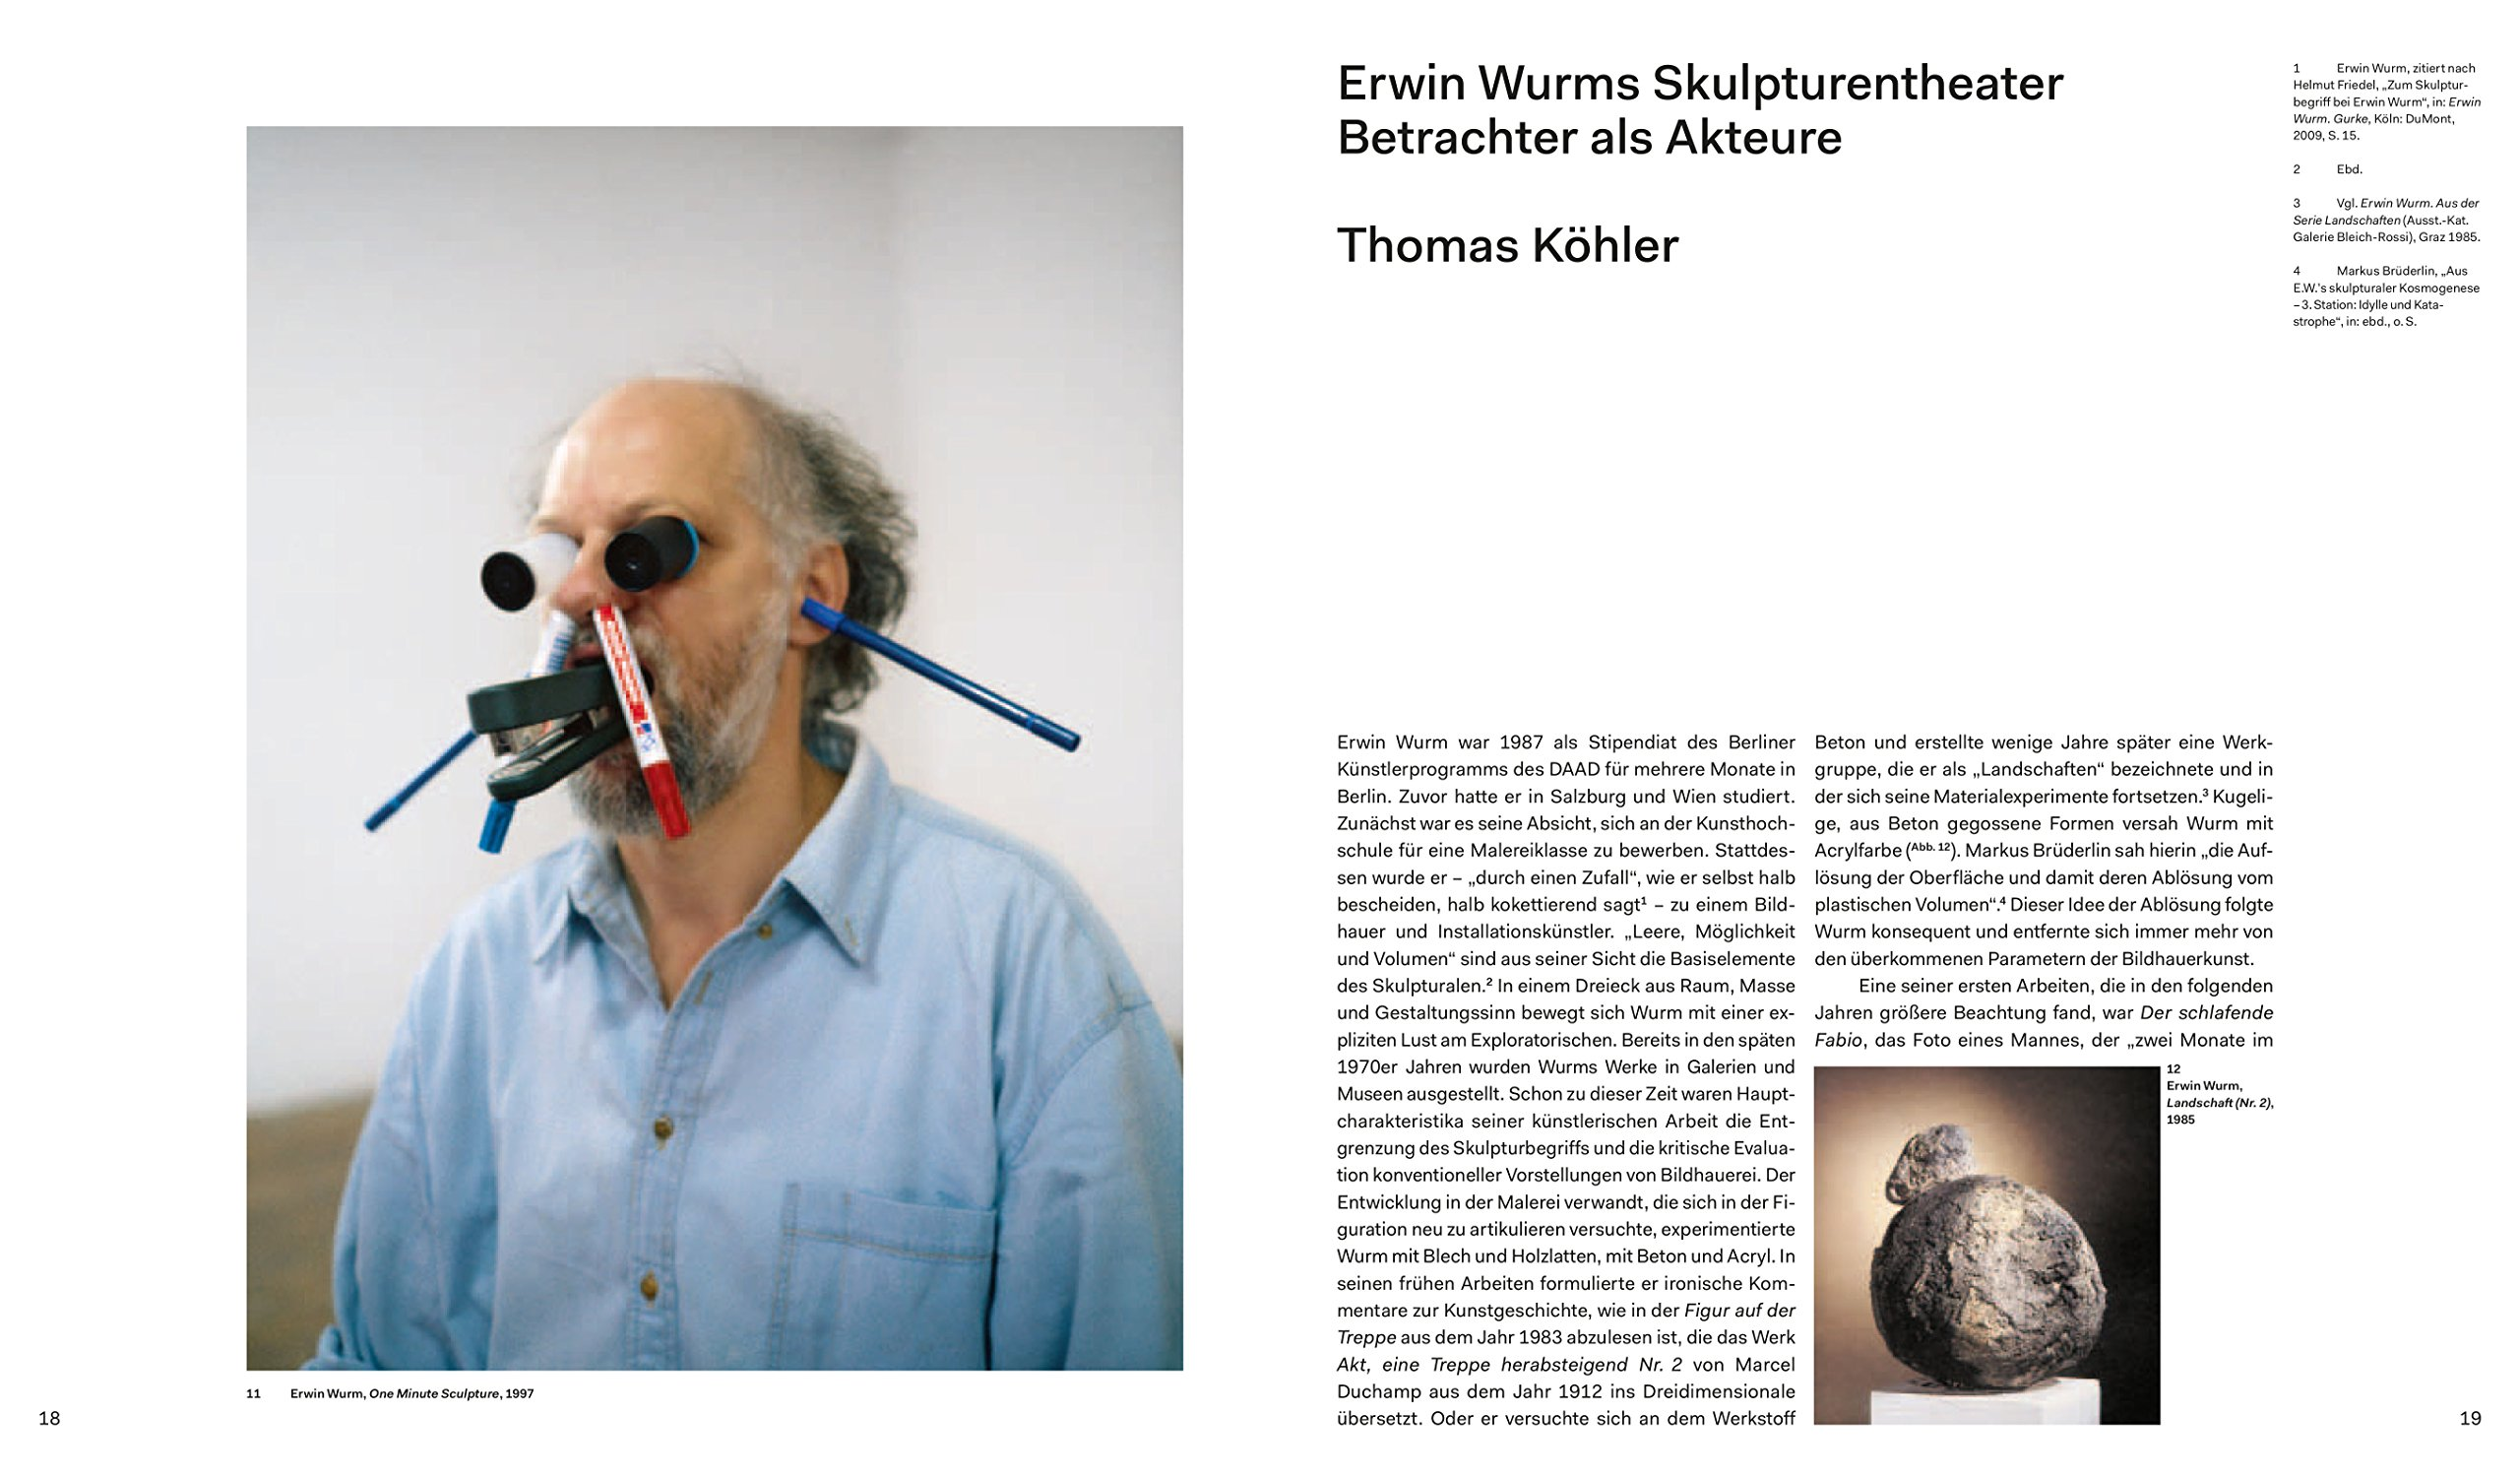 erwin wurm amazon co uk berlinische galerie books